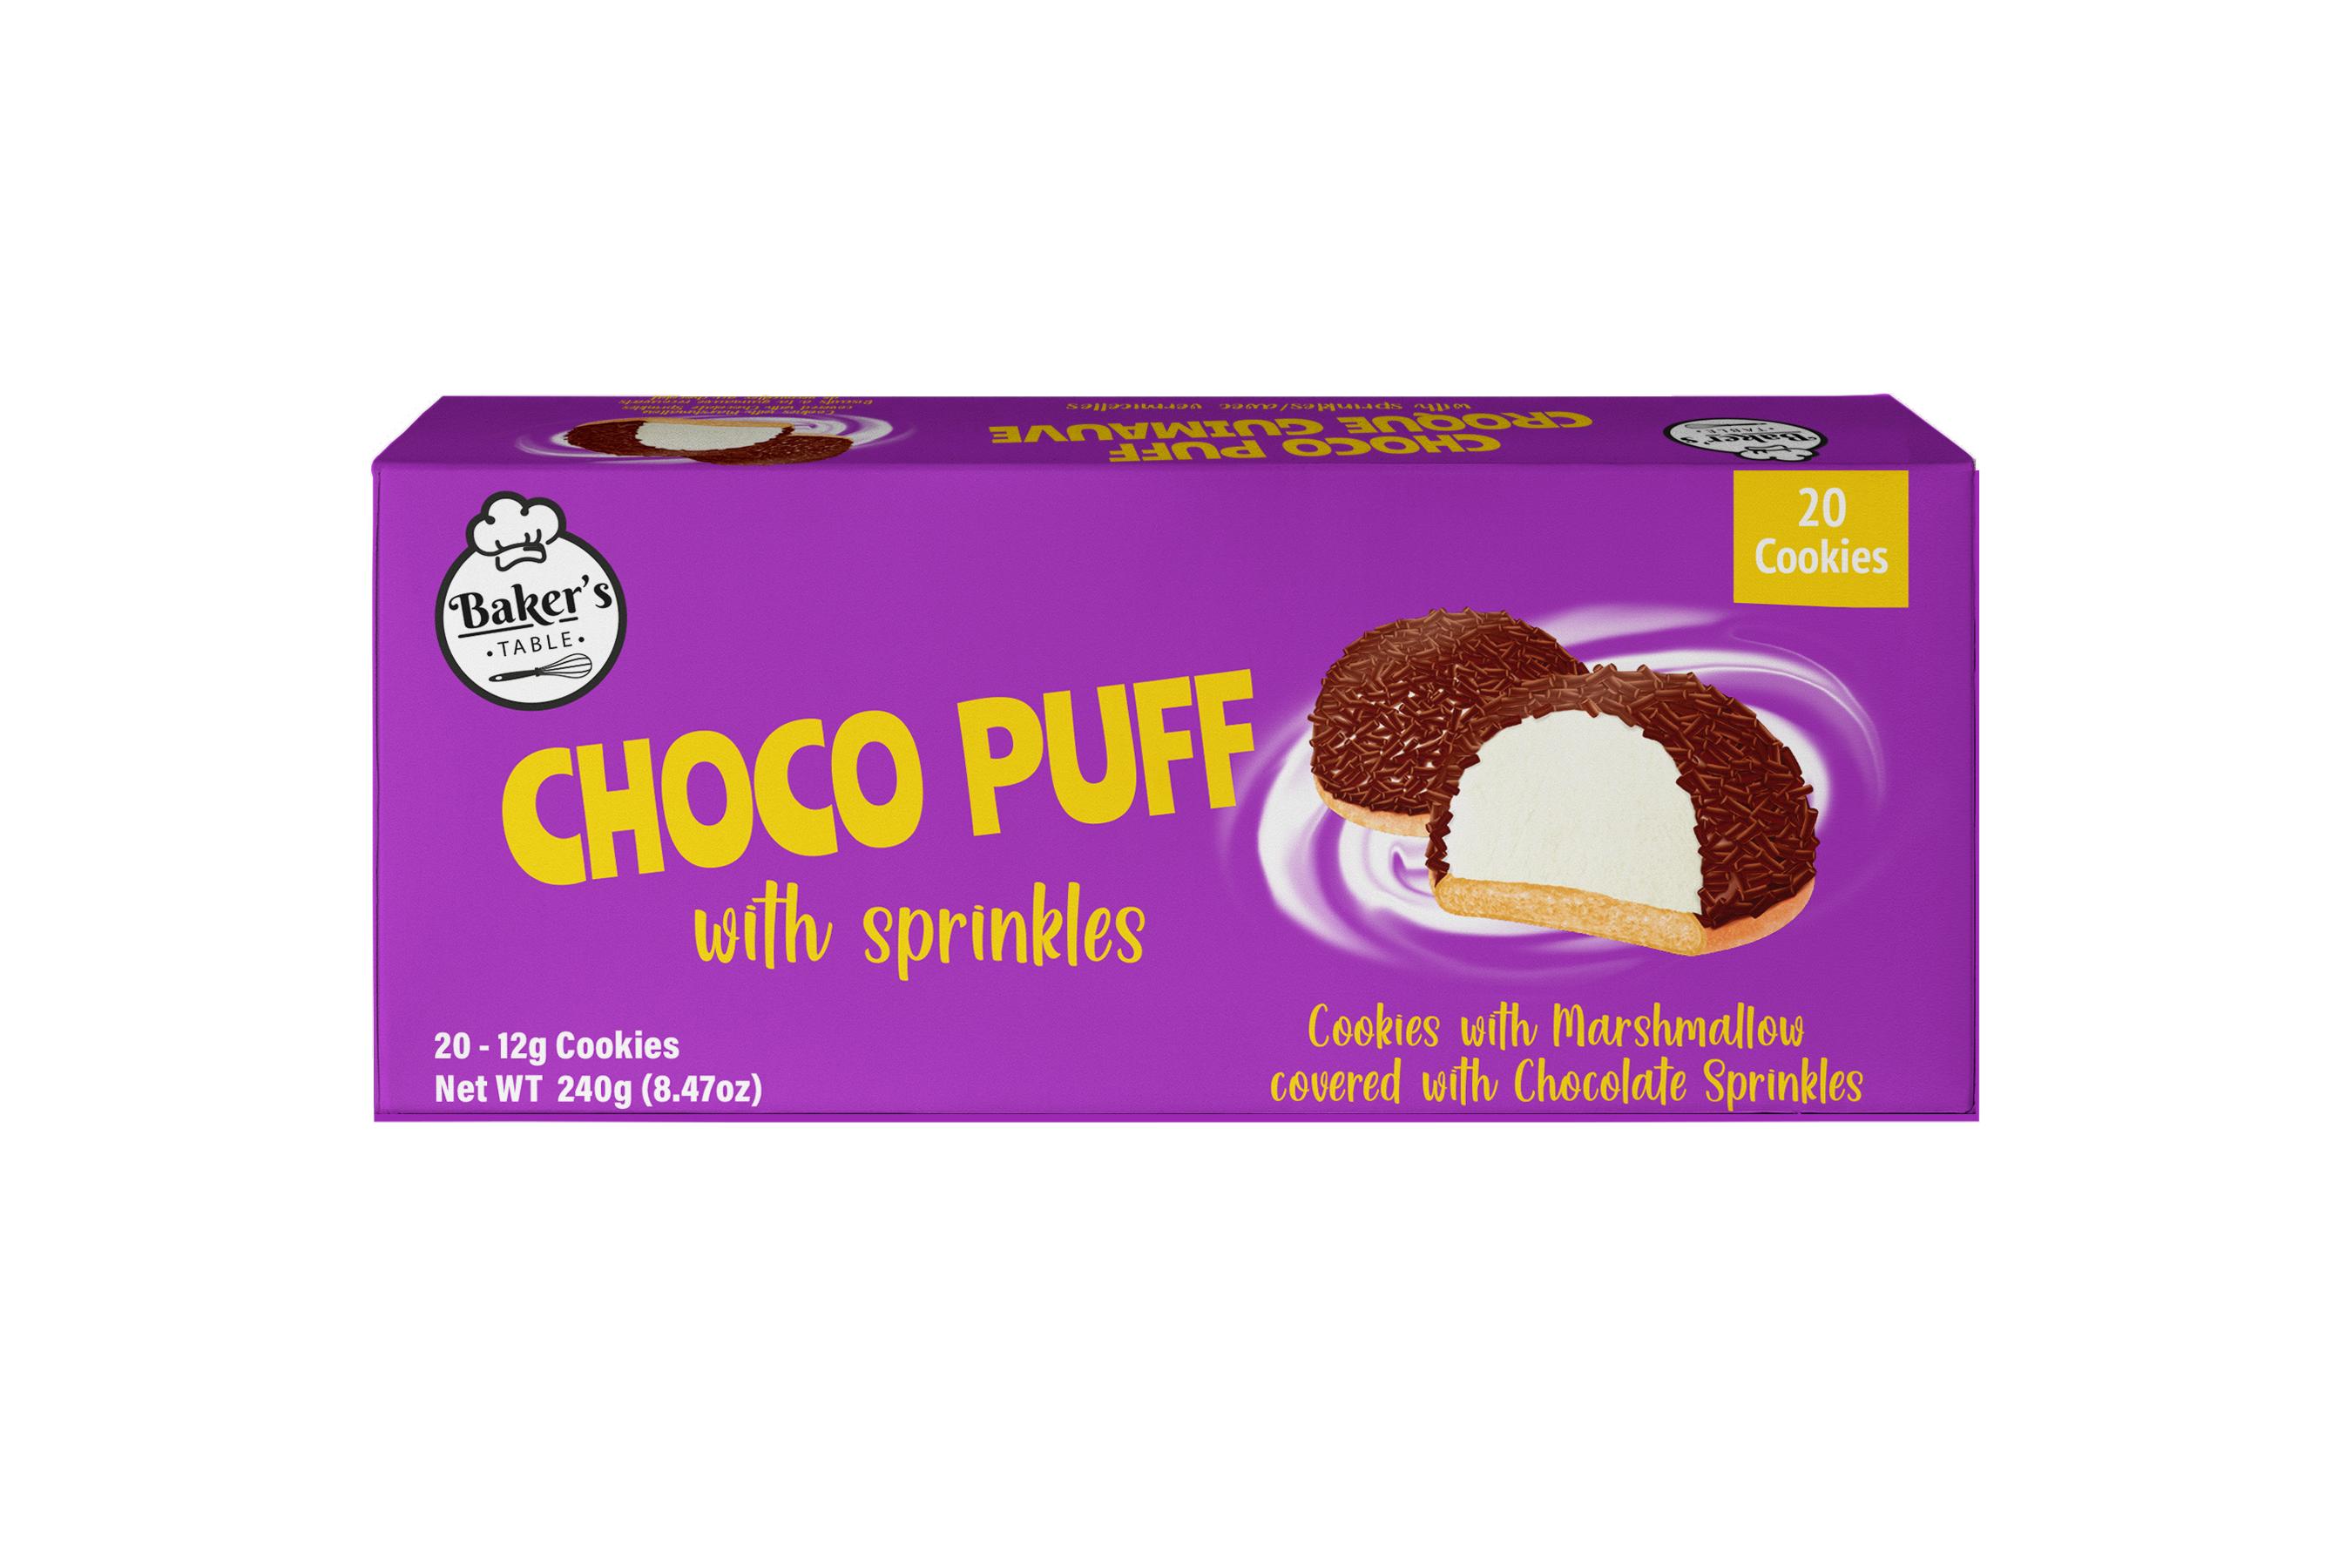 https://secureservercdn.net/198.71.233.33/oj7.4f7.myftpupload.com/wp-content/uploads/2021/03/Choco-Puffs-Sprinkles-2.png?time=1620925060?time=1620925060